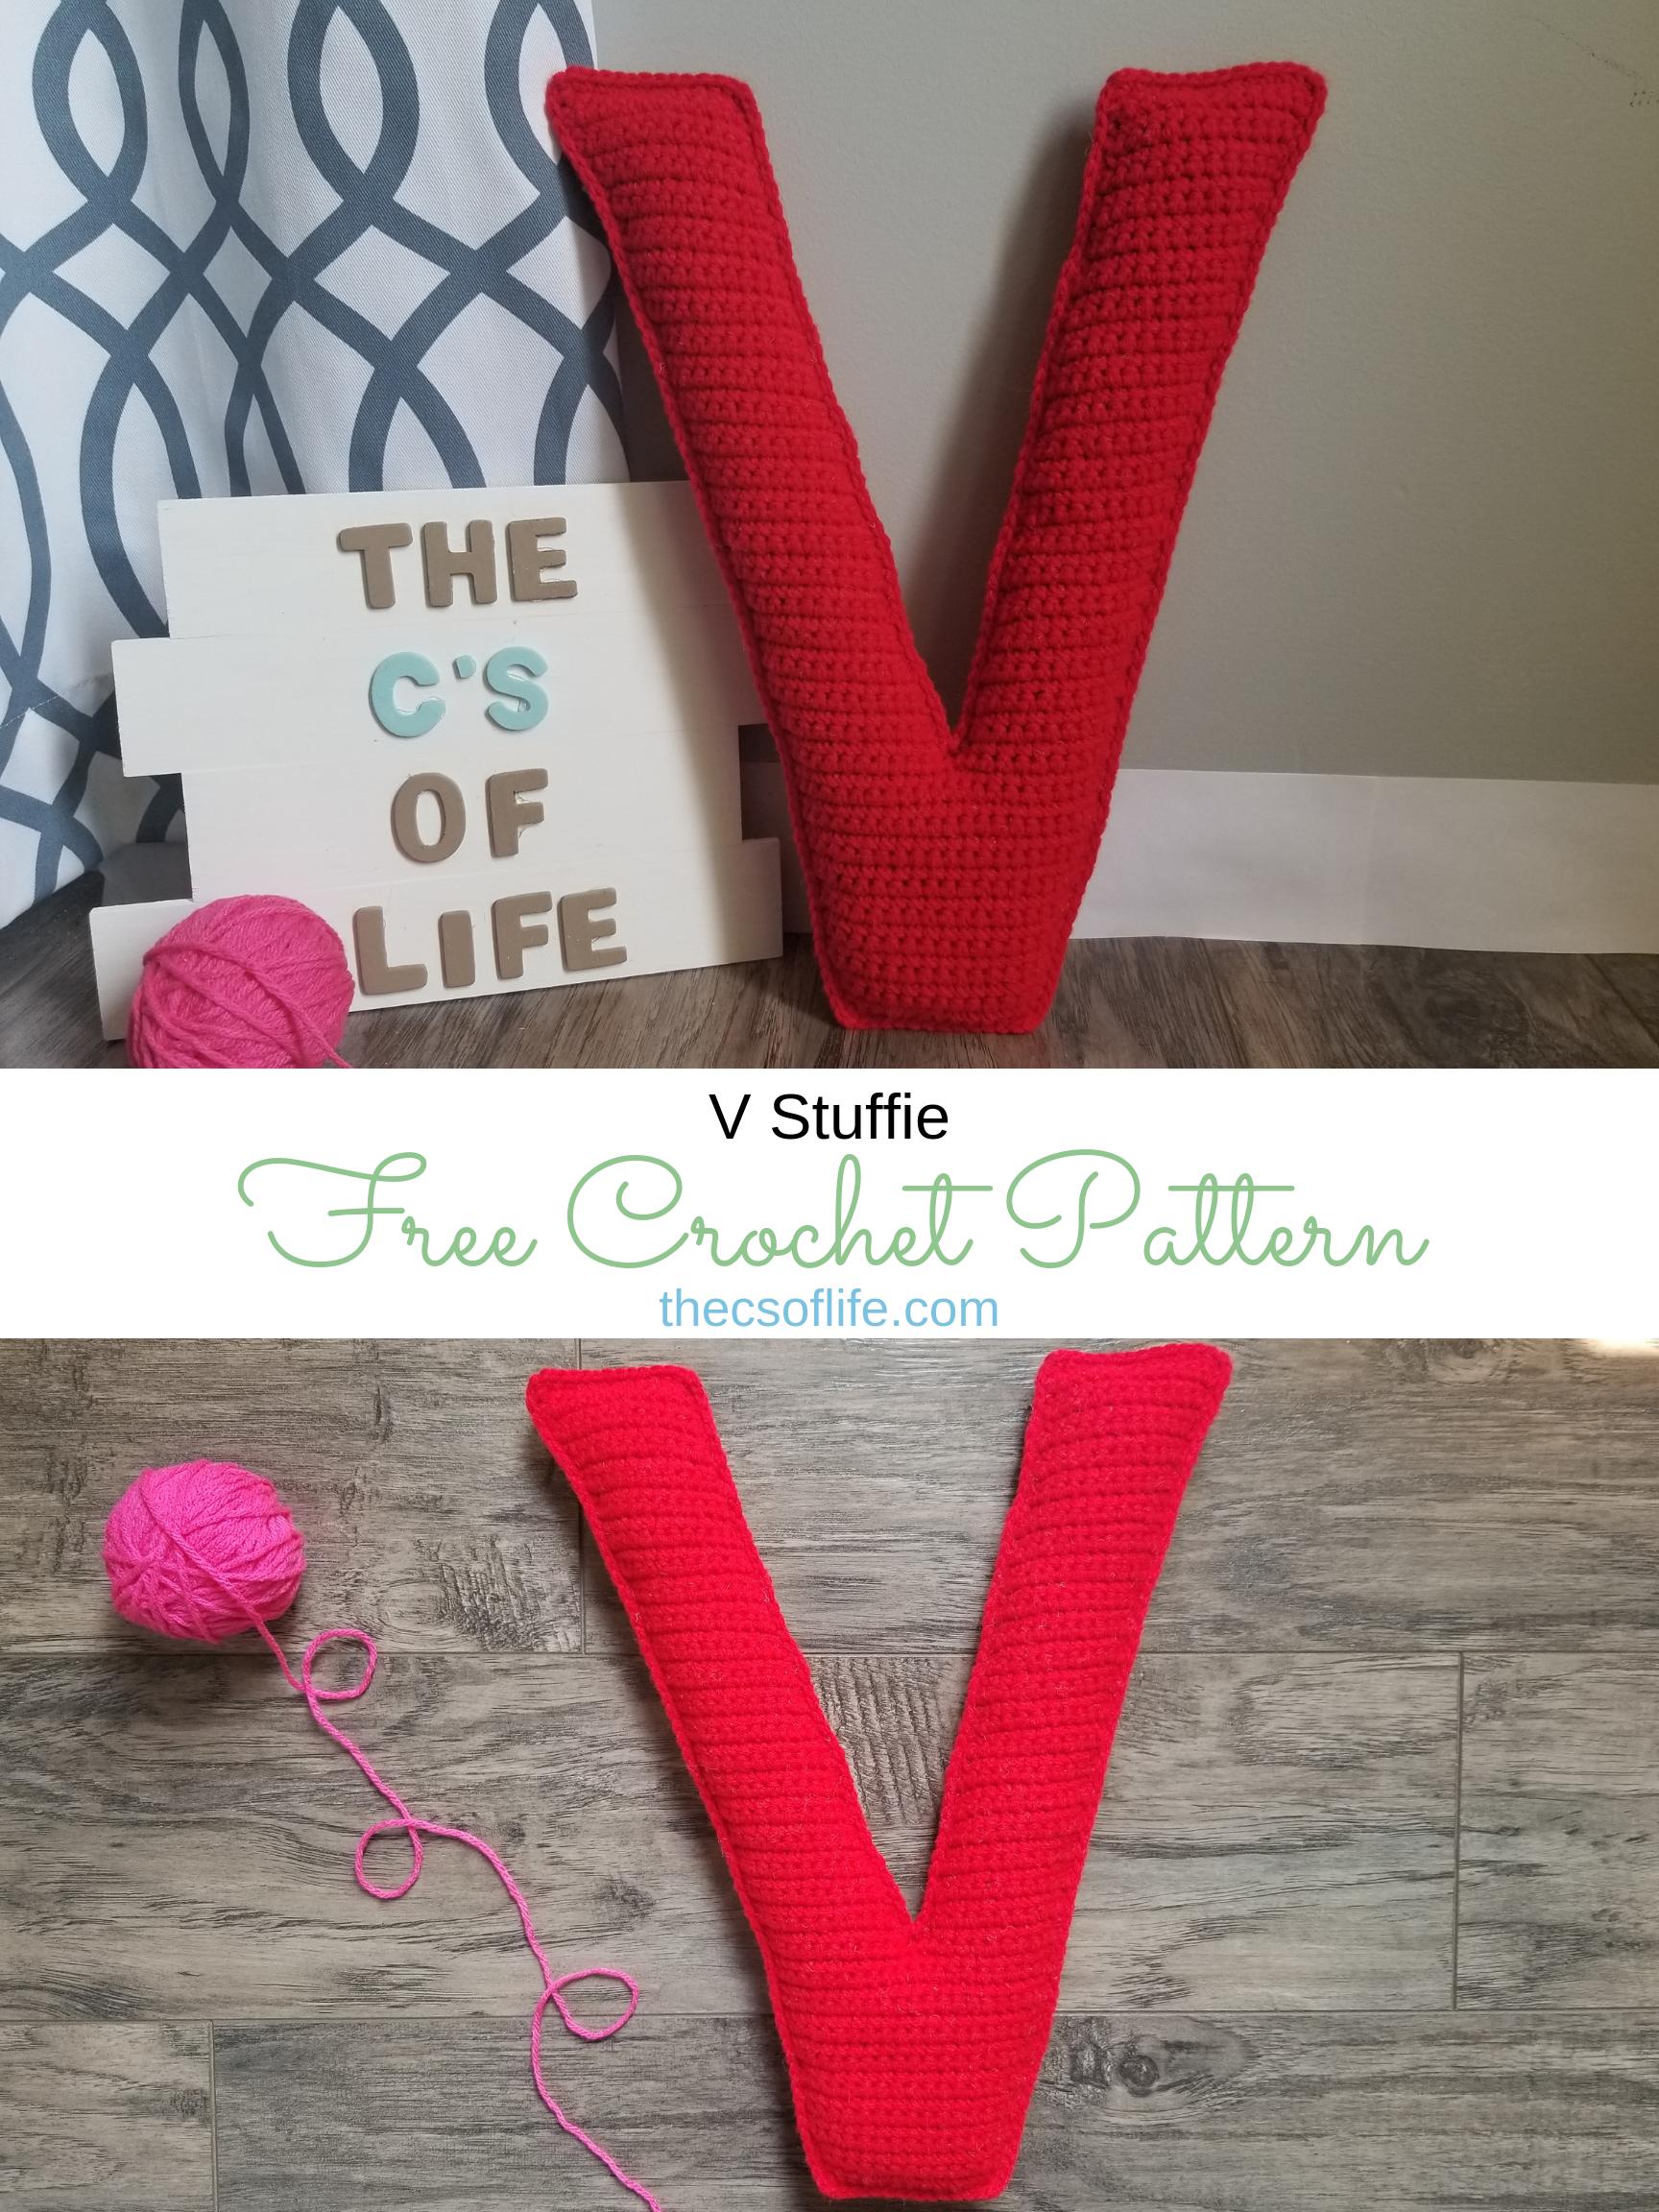 V Stuffie - Free Crochet Pattern